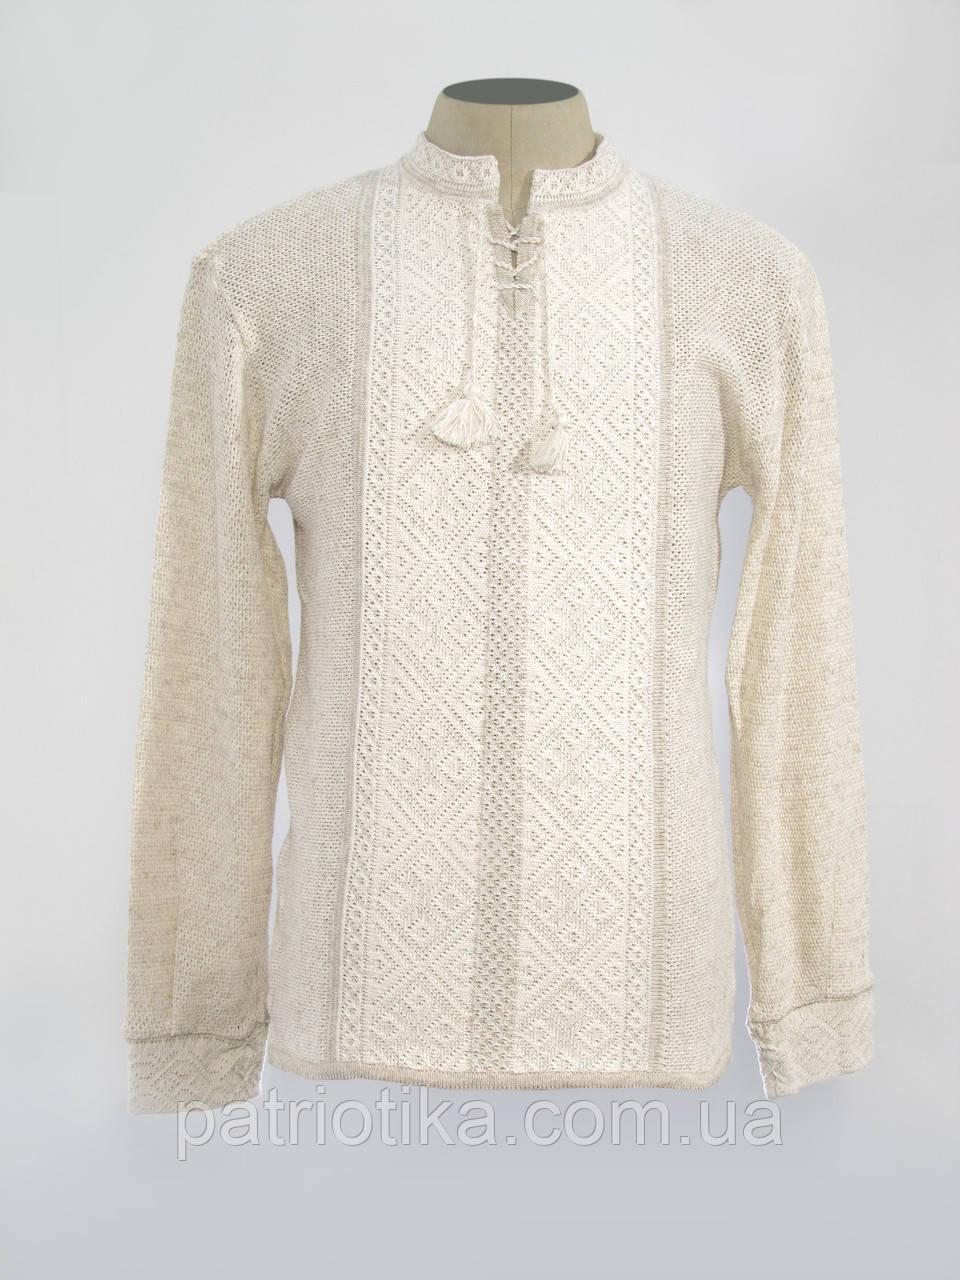 Купить мужскую вязаную вышиванку Назар | Купити чоловічу в'язану вишиванку Назар